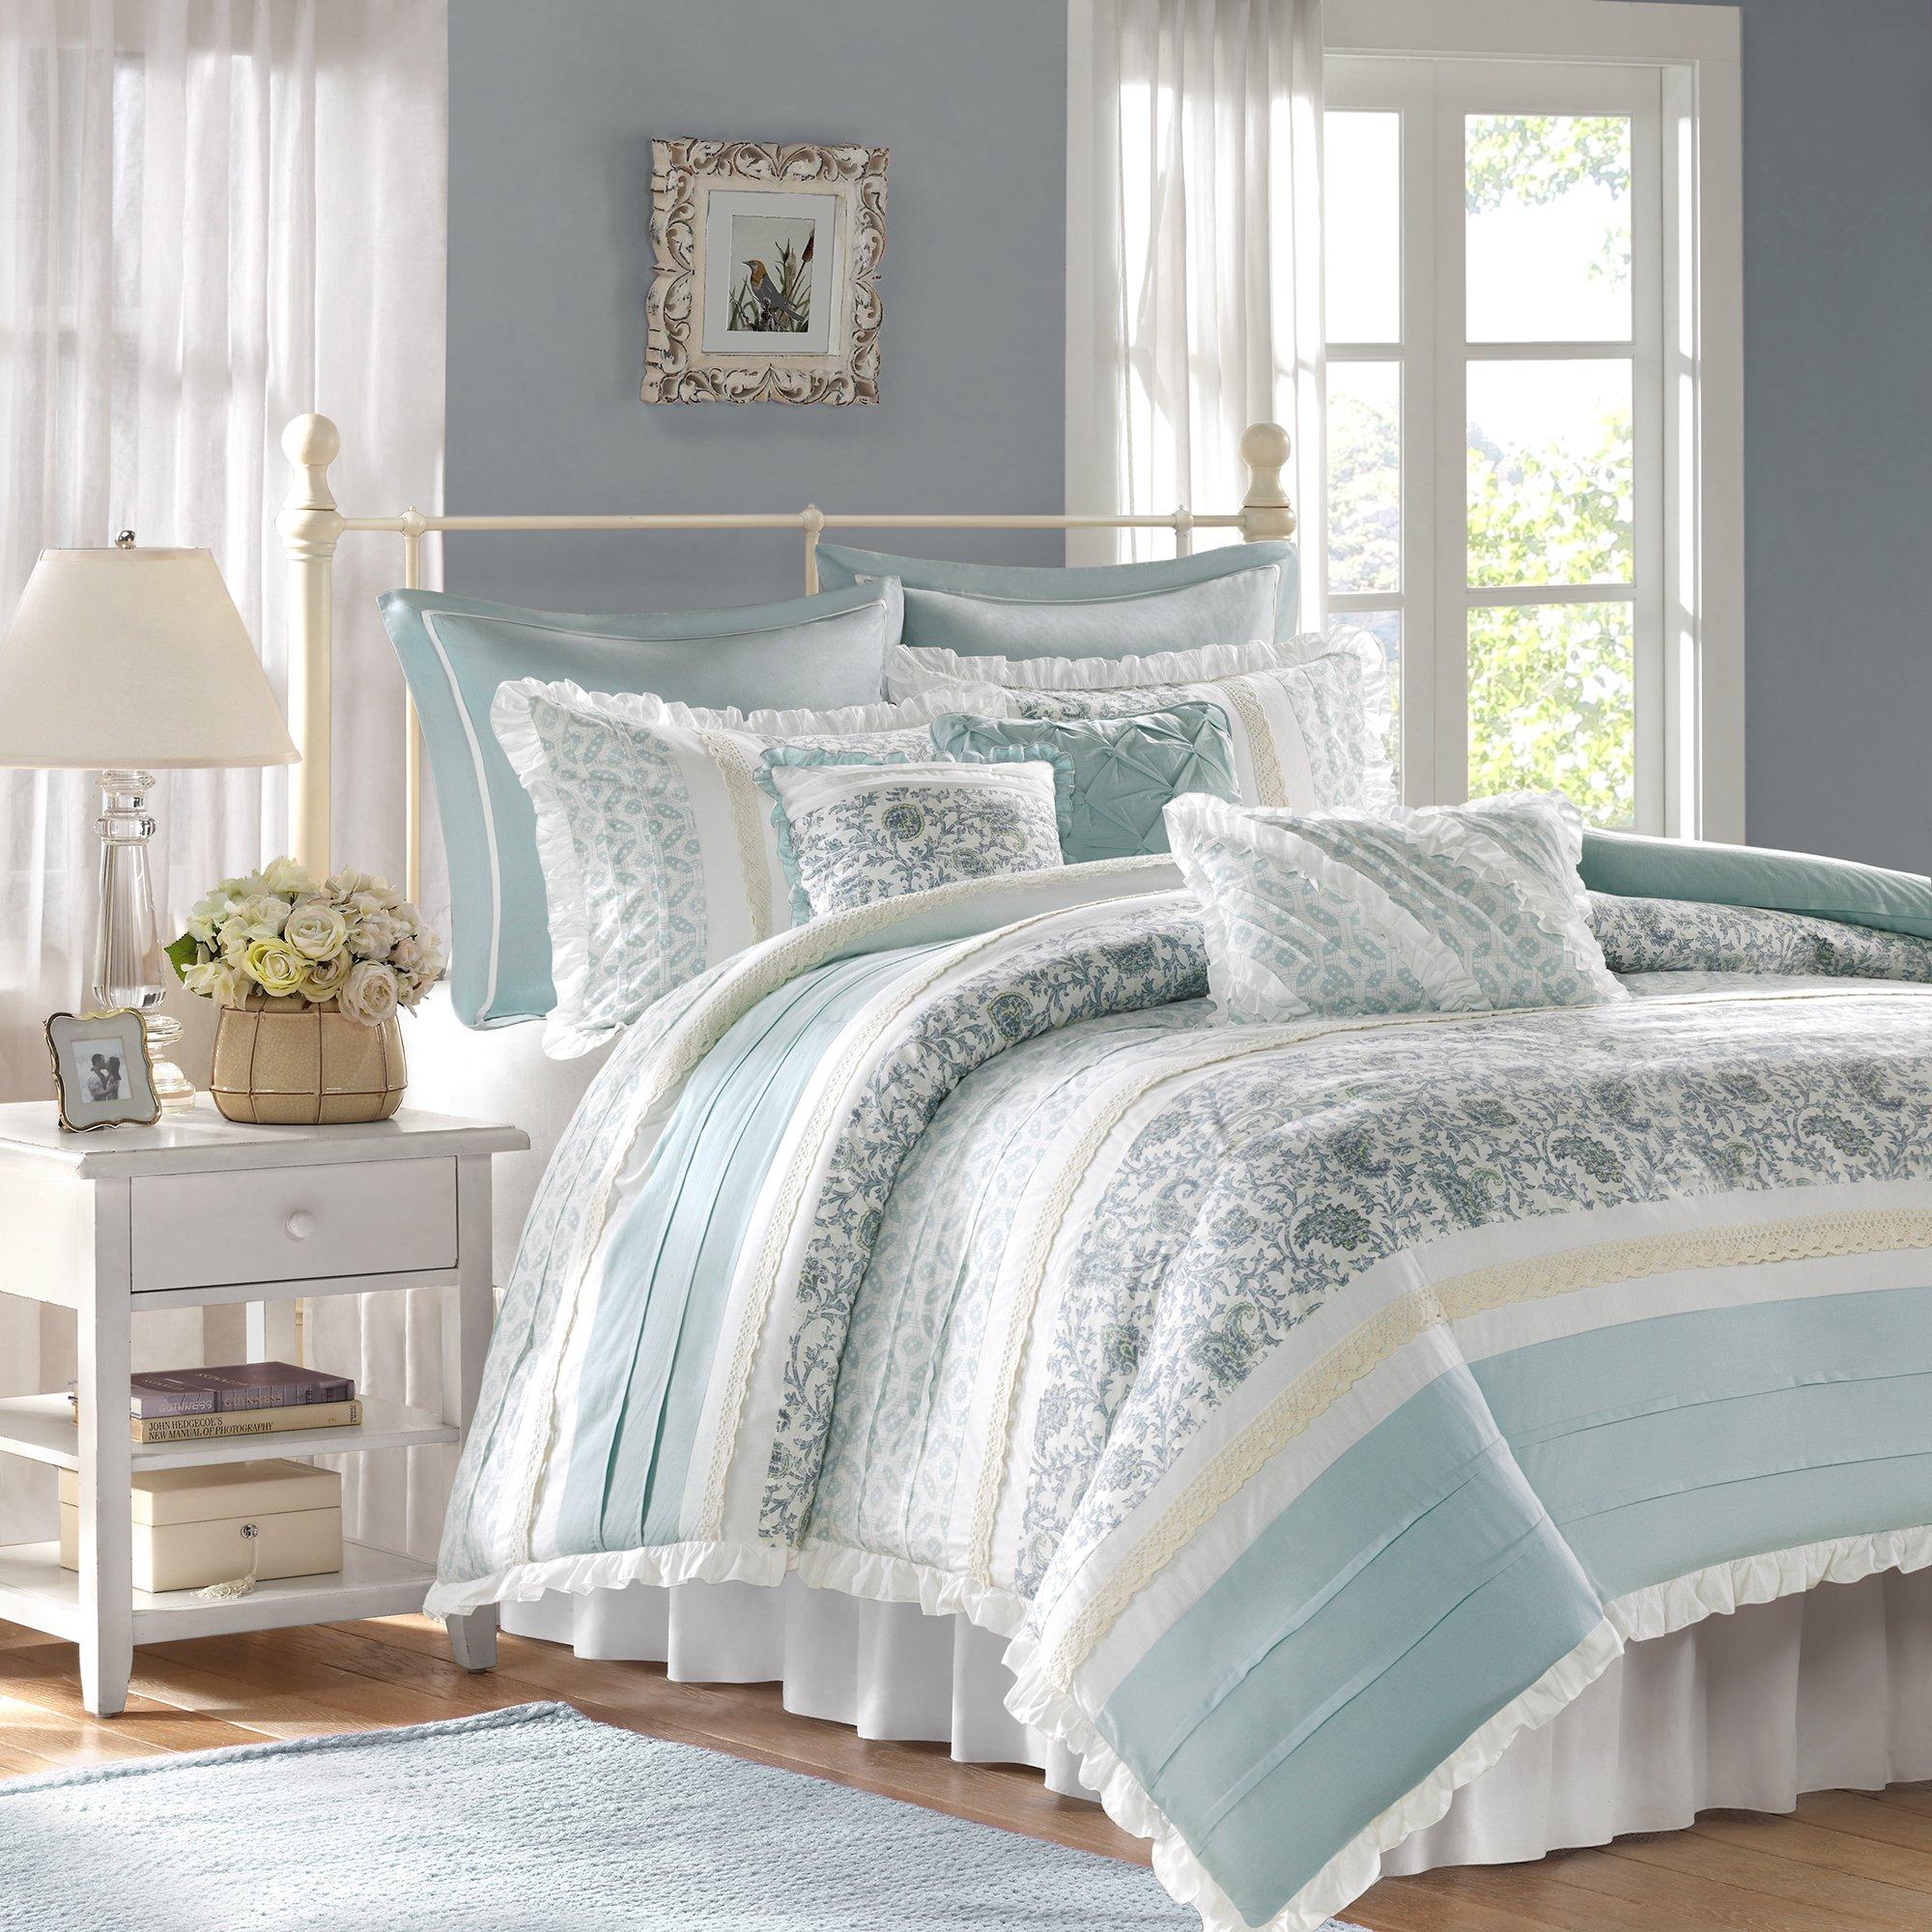 Madison Park - Dawn 9 Piece Cotton Percale Cotton Duvet Cover Set - Blue - Queen - Pieced Pattern - Includes 1 Duvet Cover, 2 Shams, 3 Decorative Pillows,2 Euro Shams,1 Bed Skirt